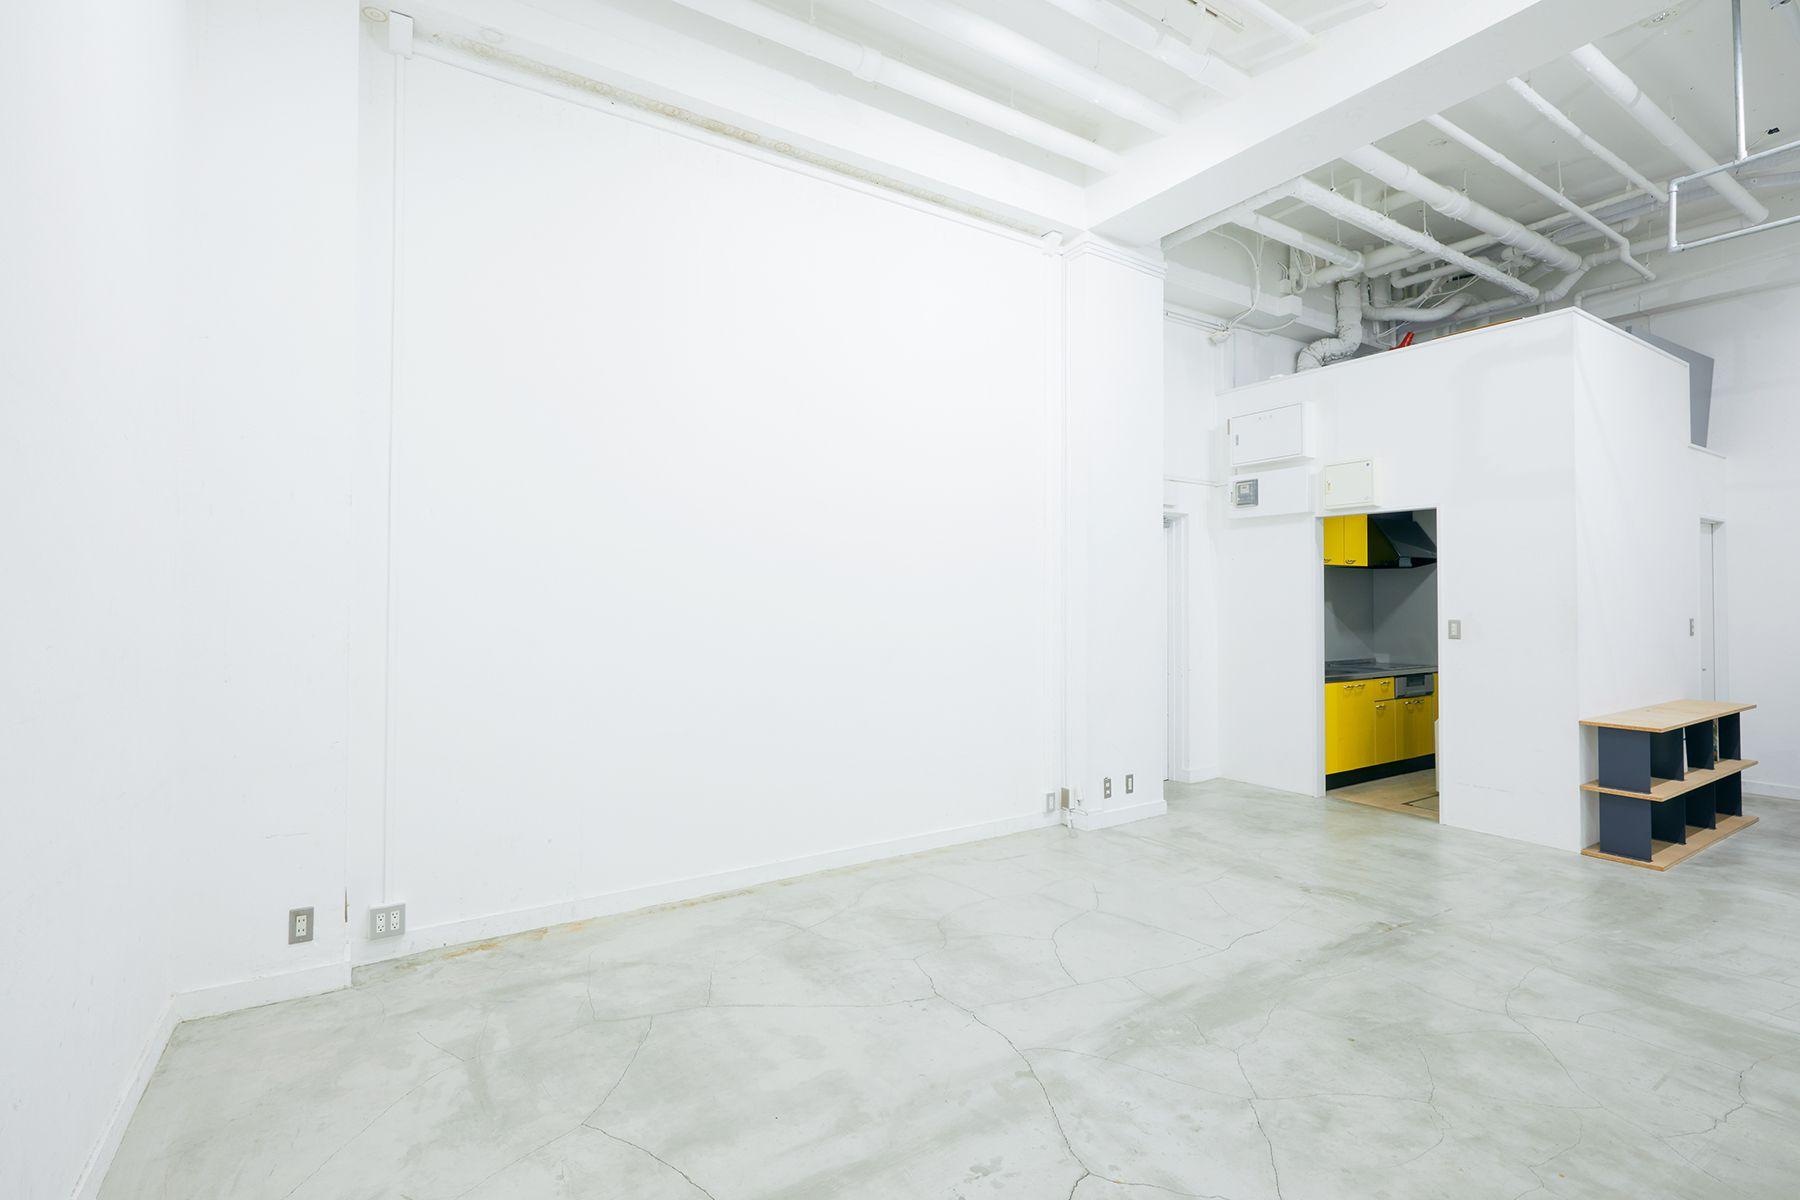 sinca studio 中野坂上 (シンカ スタジオ)天井高4mの開放的な空間